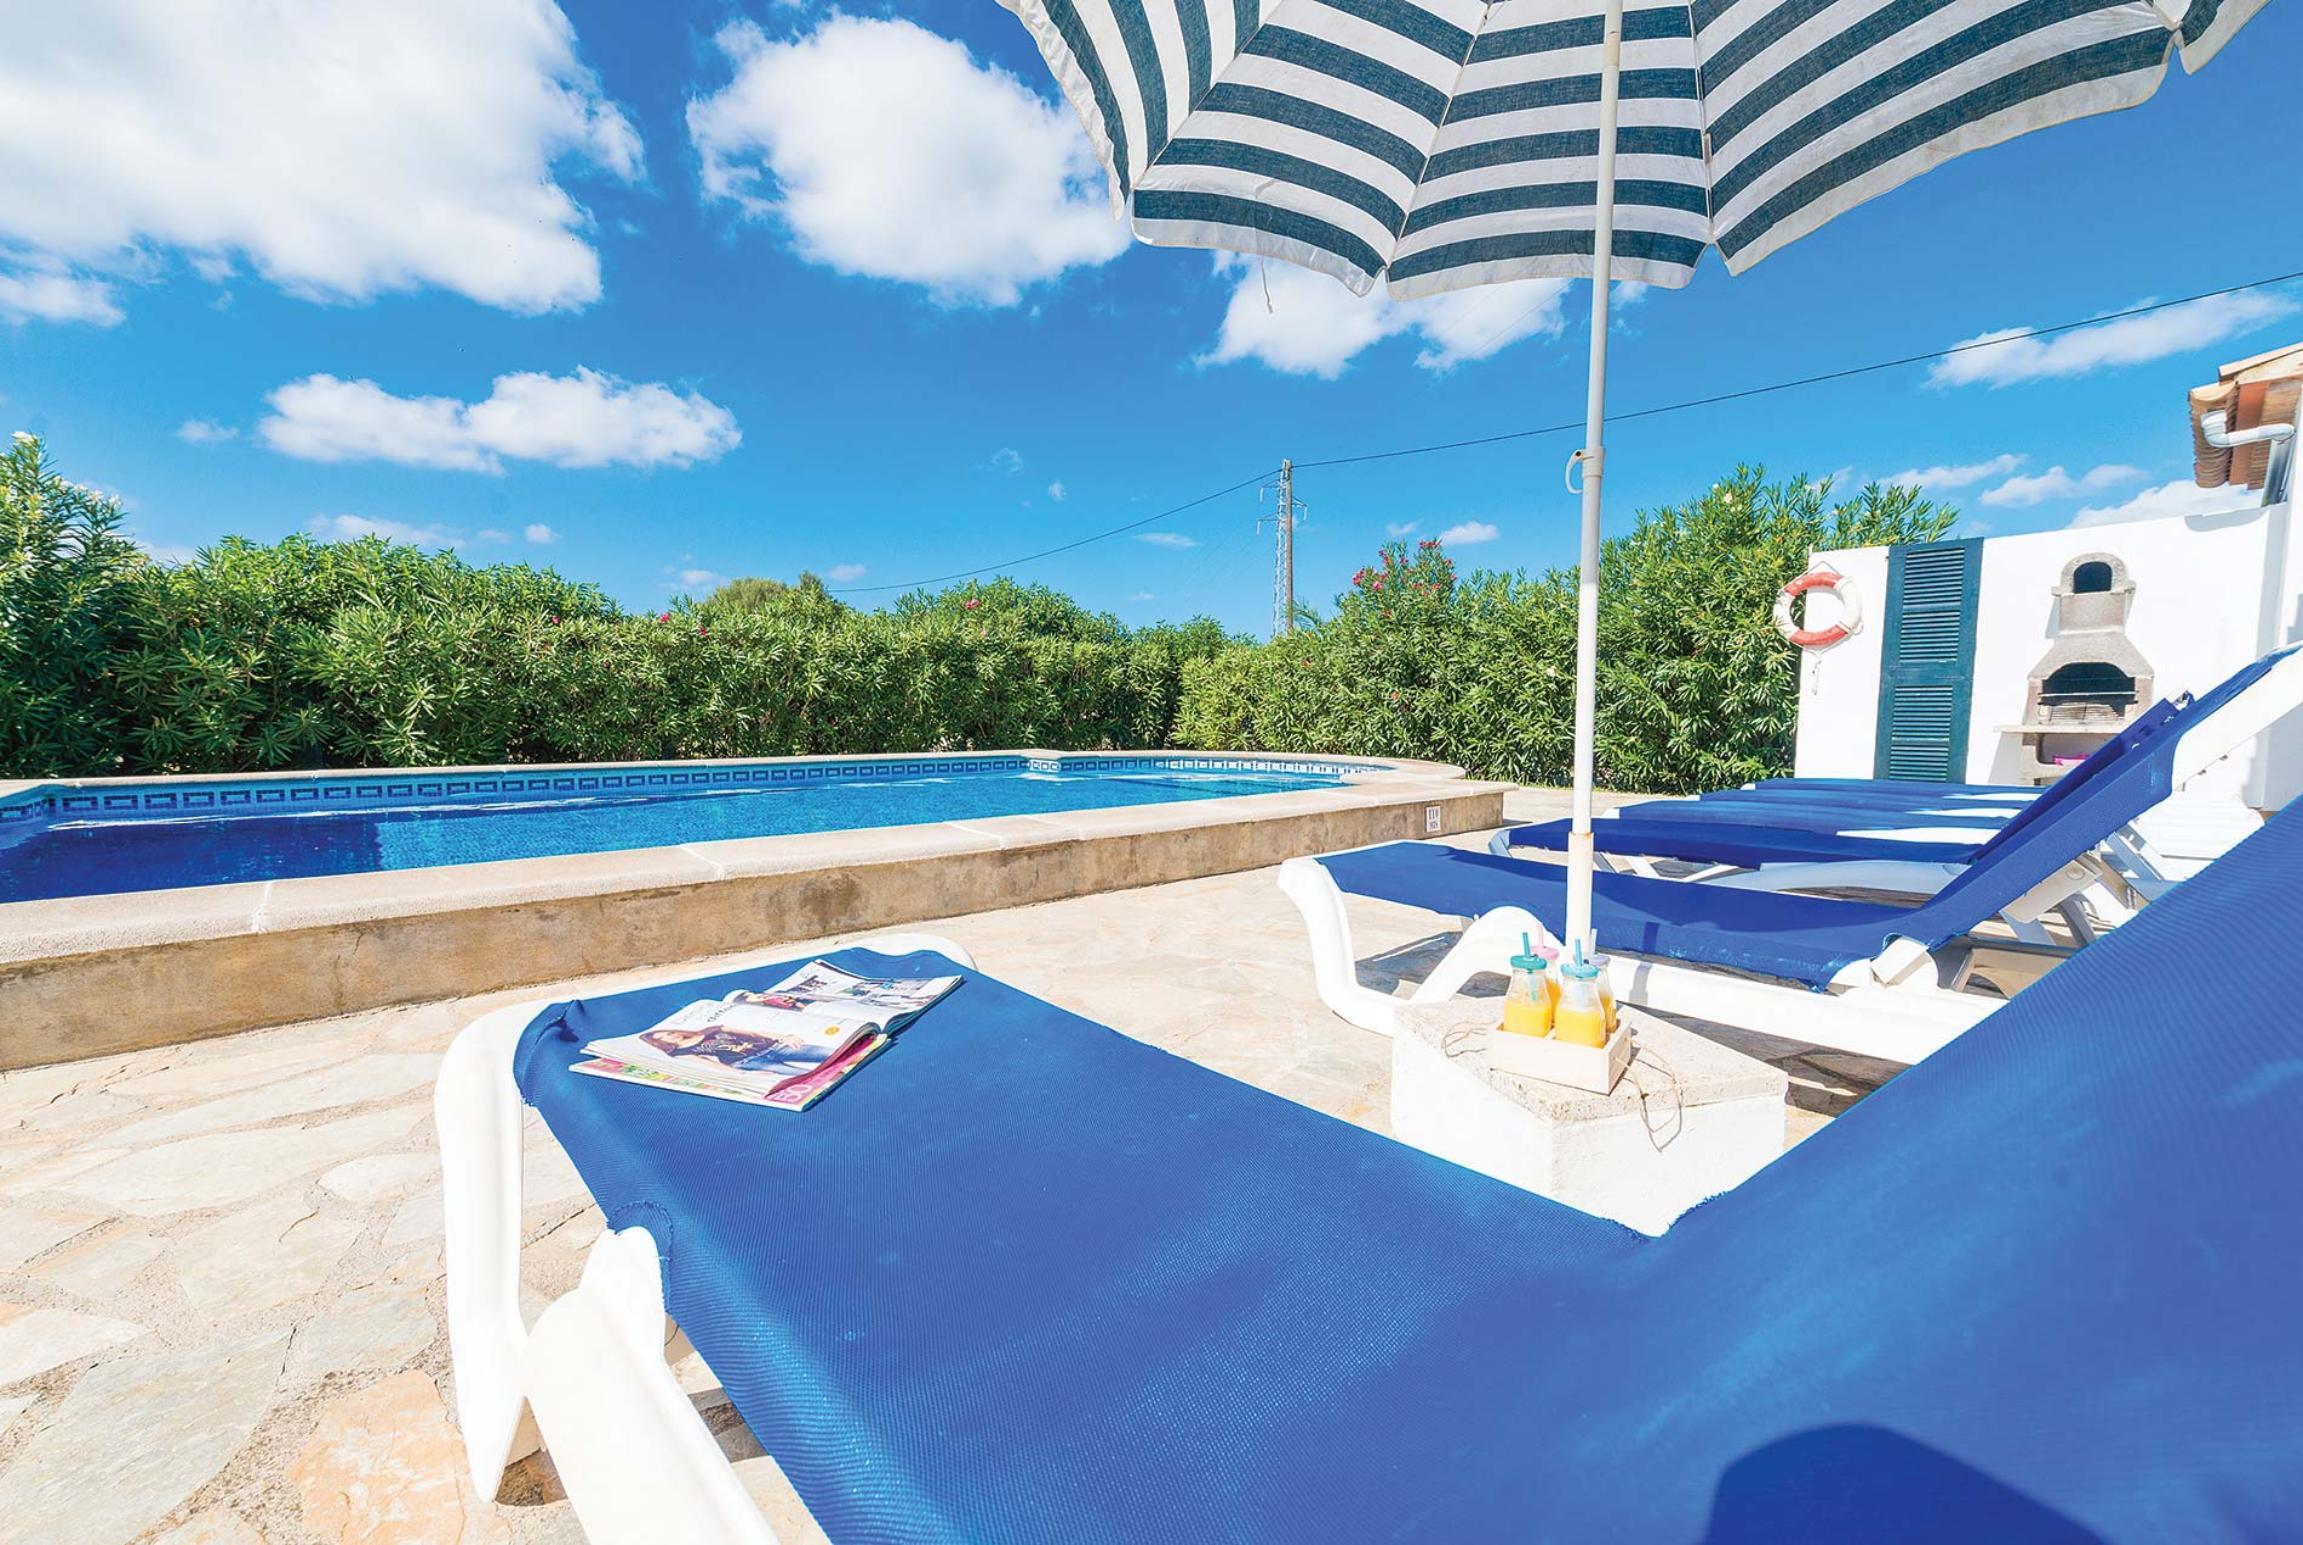 Ferienhaus Rasca (2654350), Formentor, Mallorca, Balearische Inseln, Spanien, Bild 17